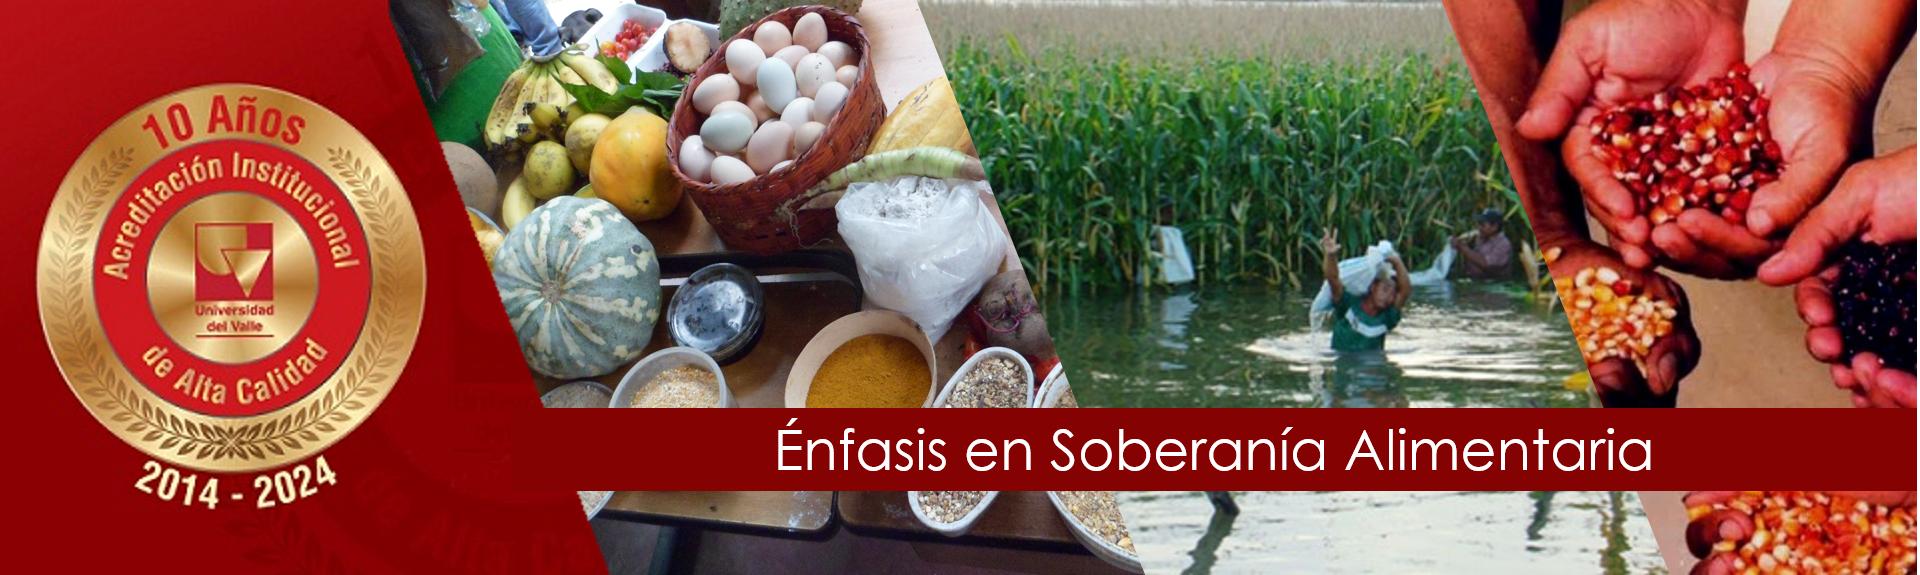 enfasis en soberania alimentaria